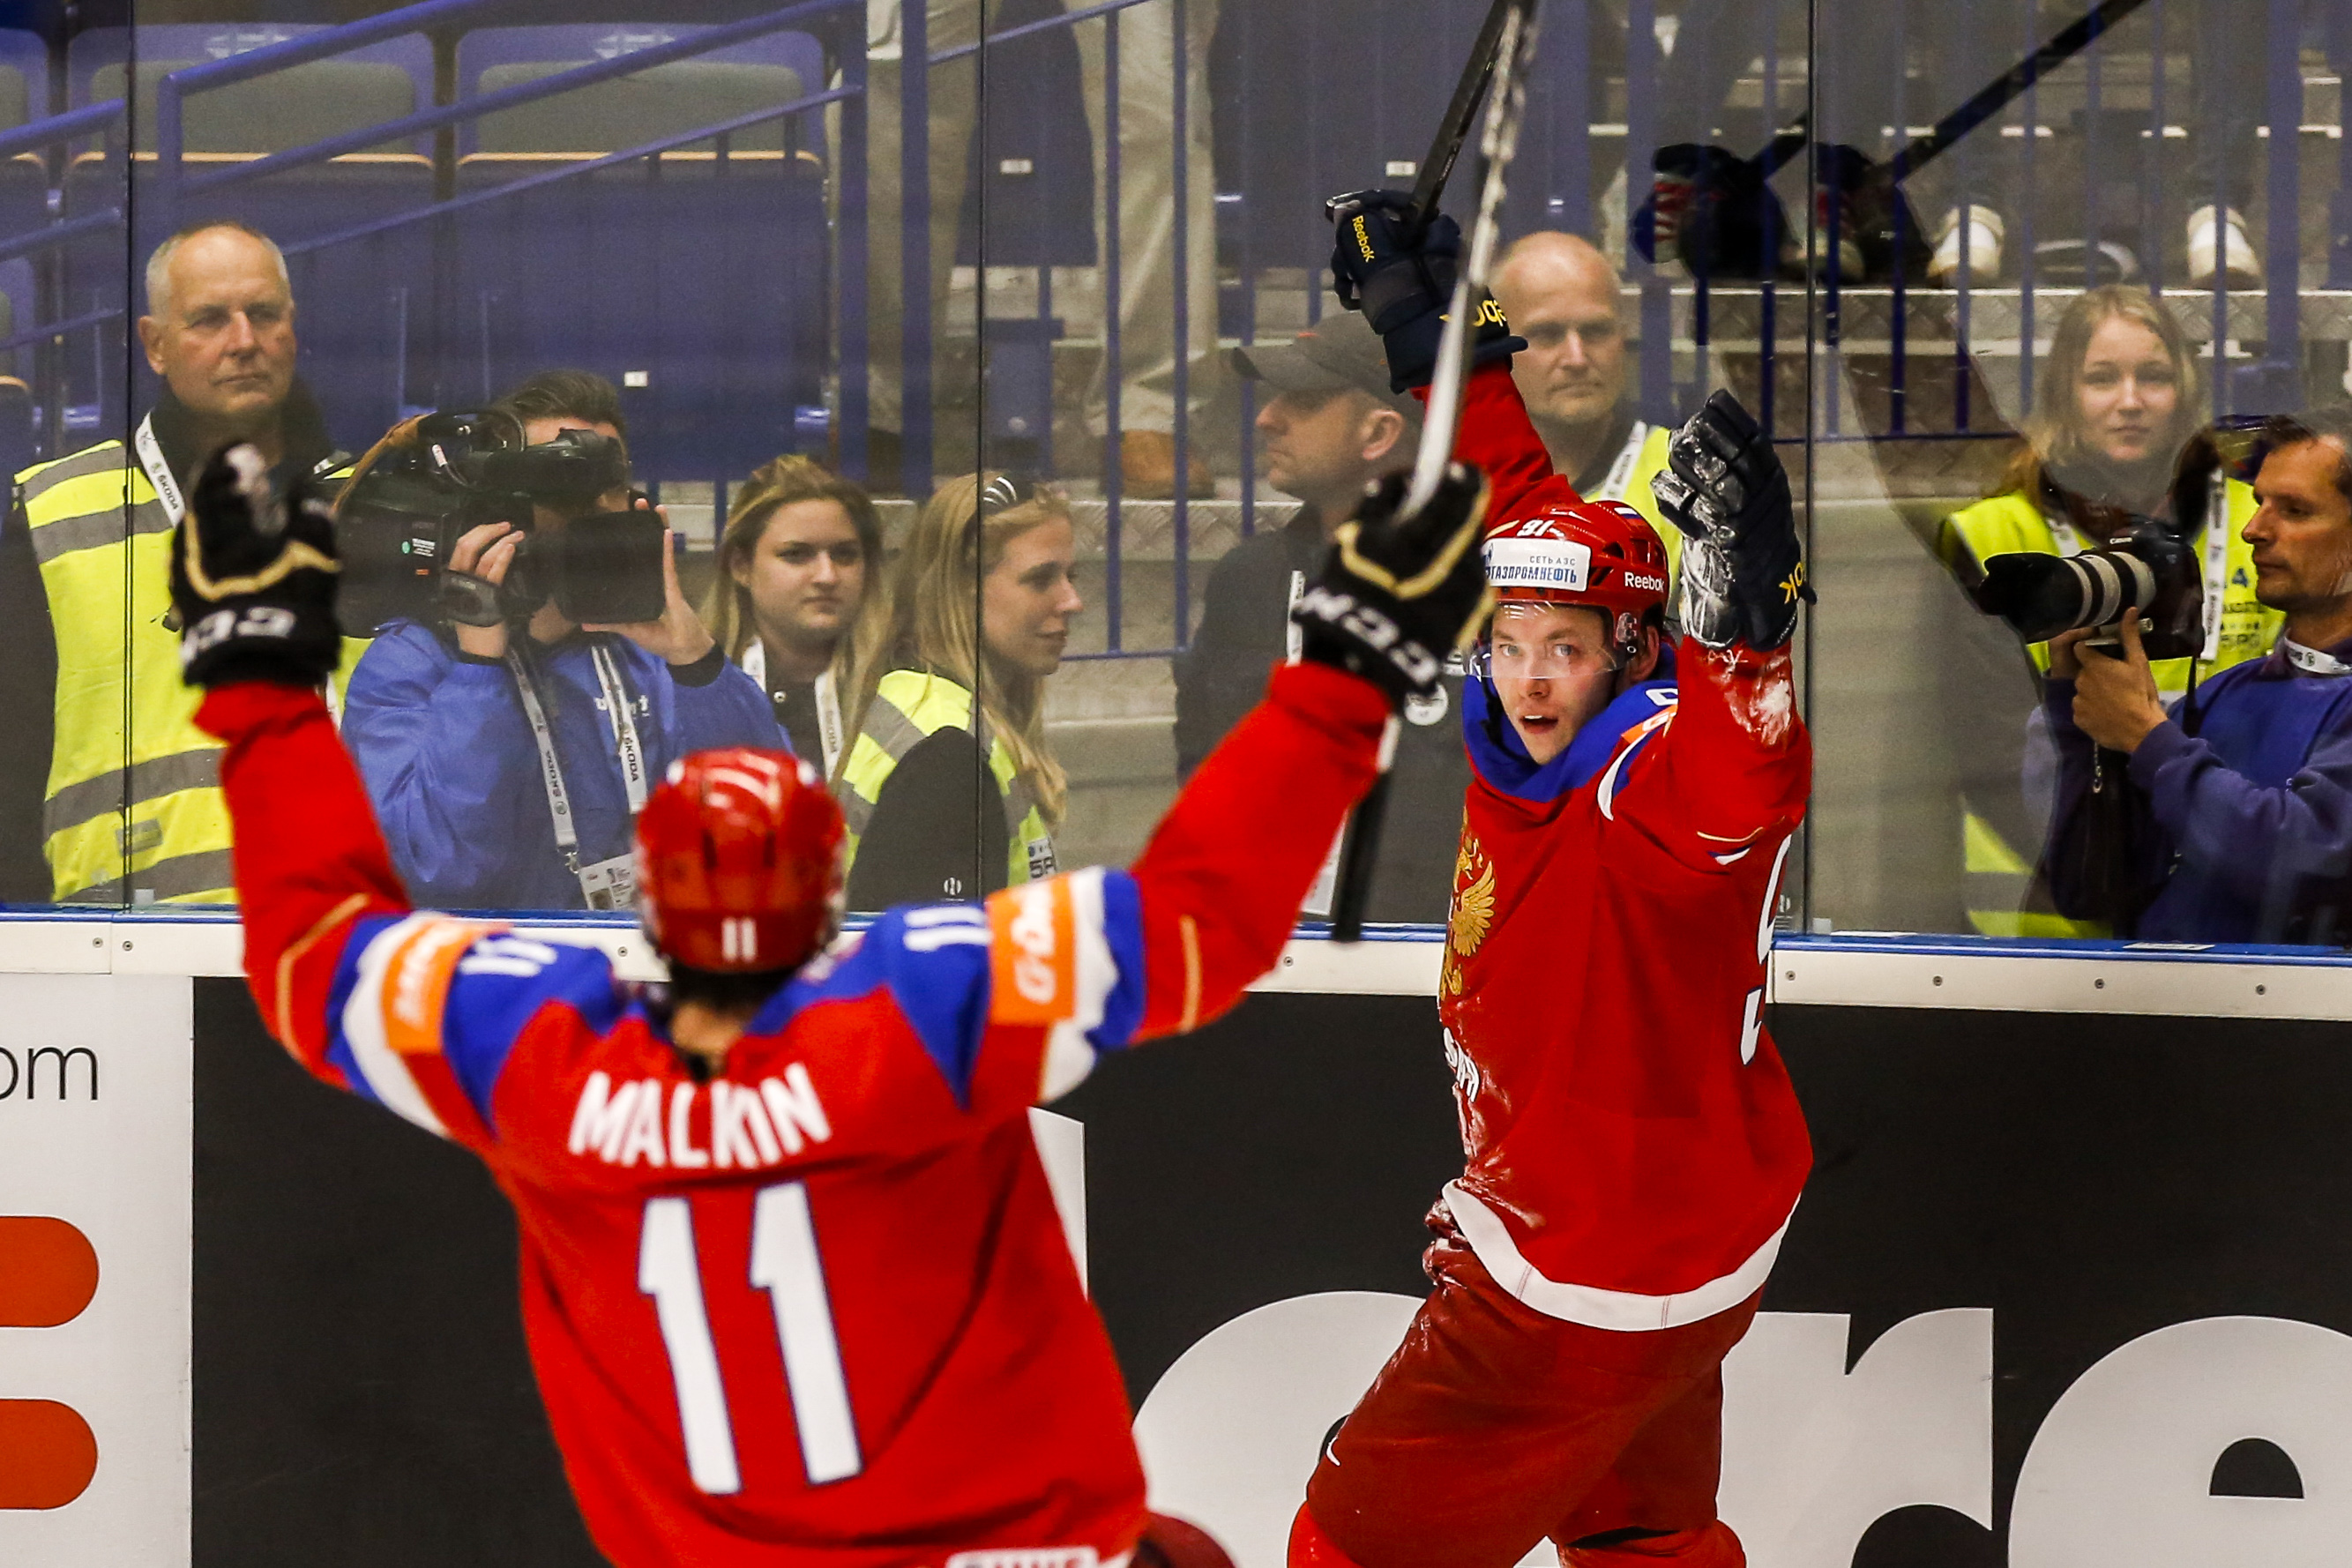 Sweden v Russia - 2015 IIHF Ice Hockey World Championship Quarter Final